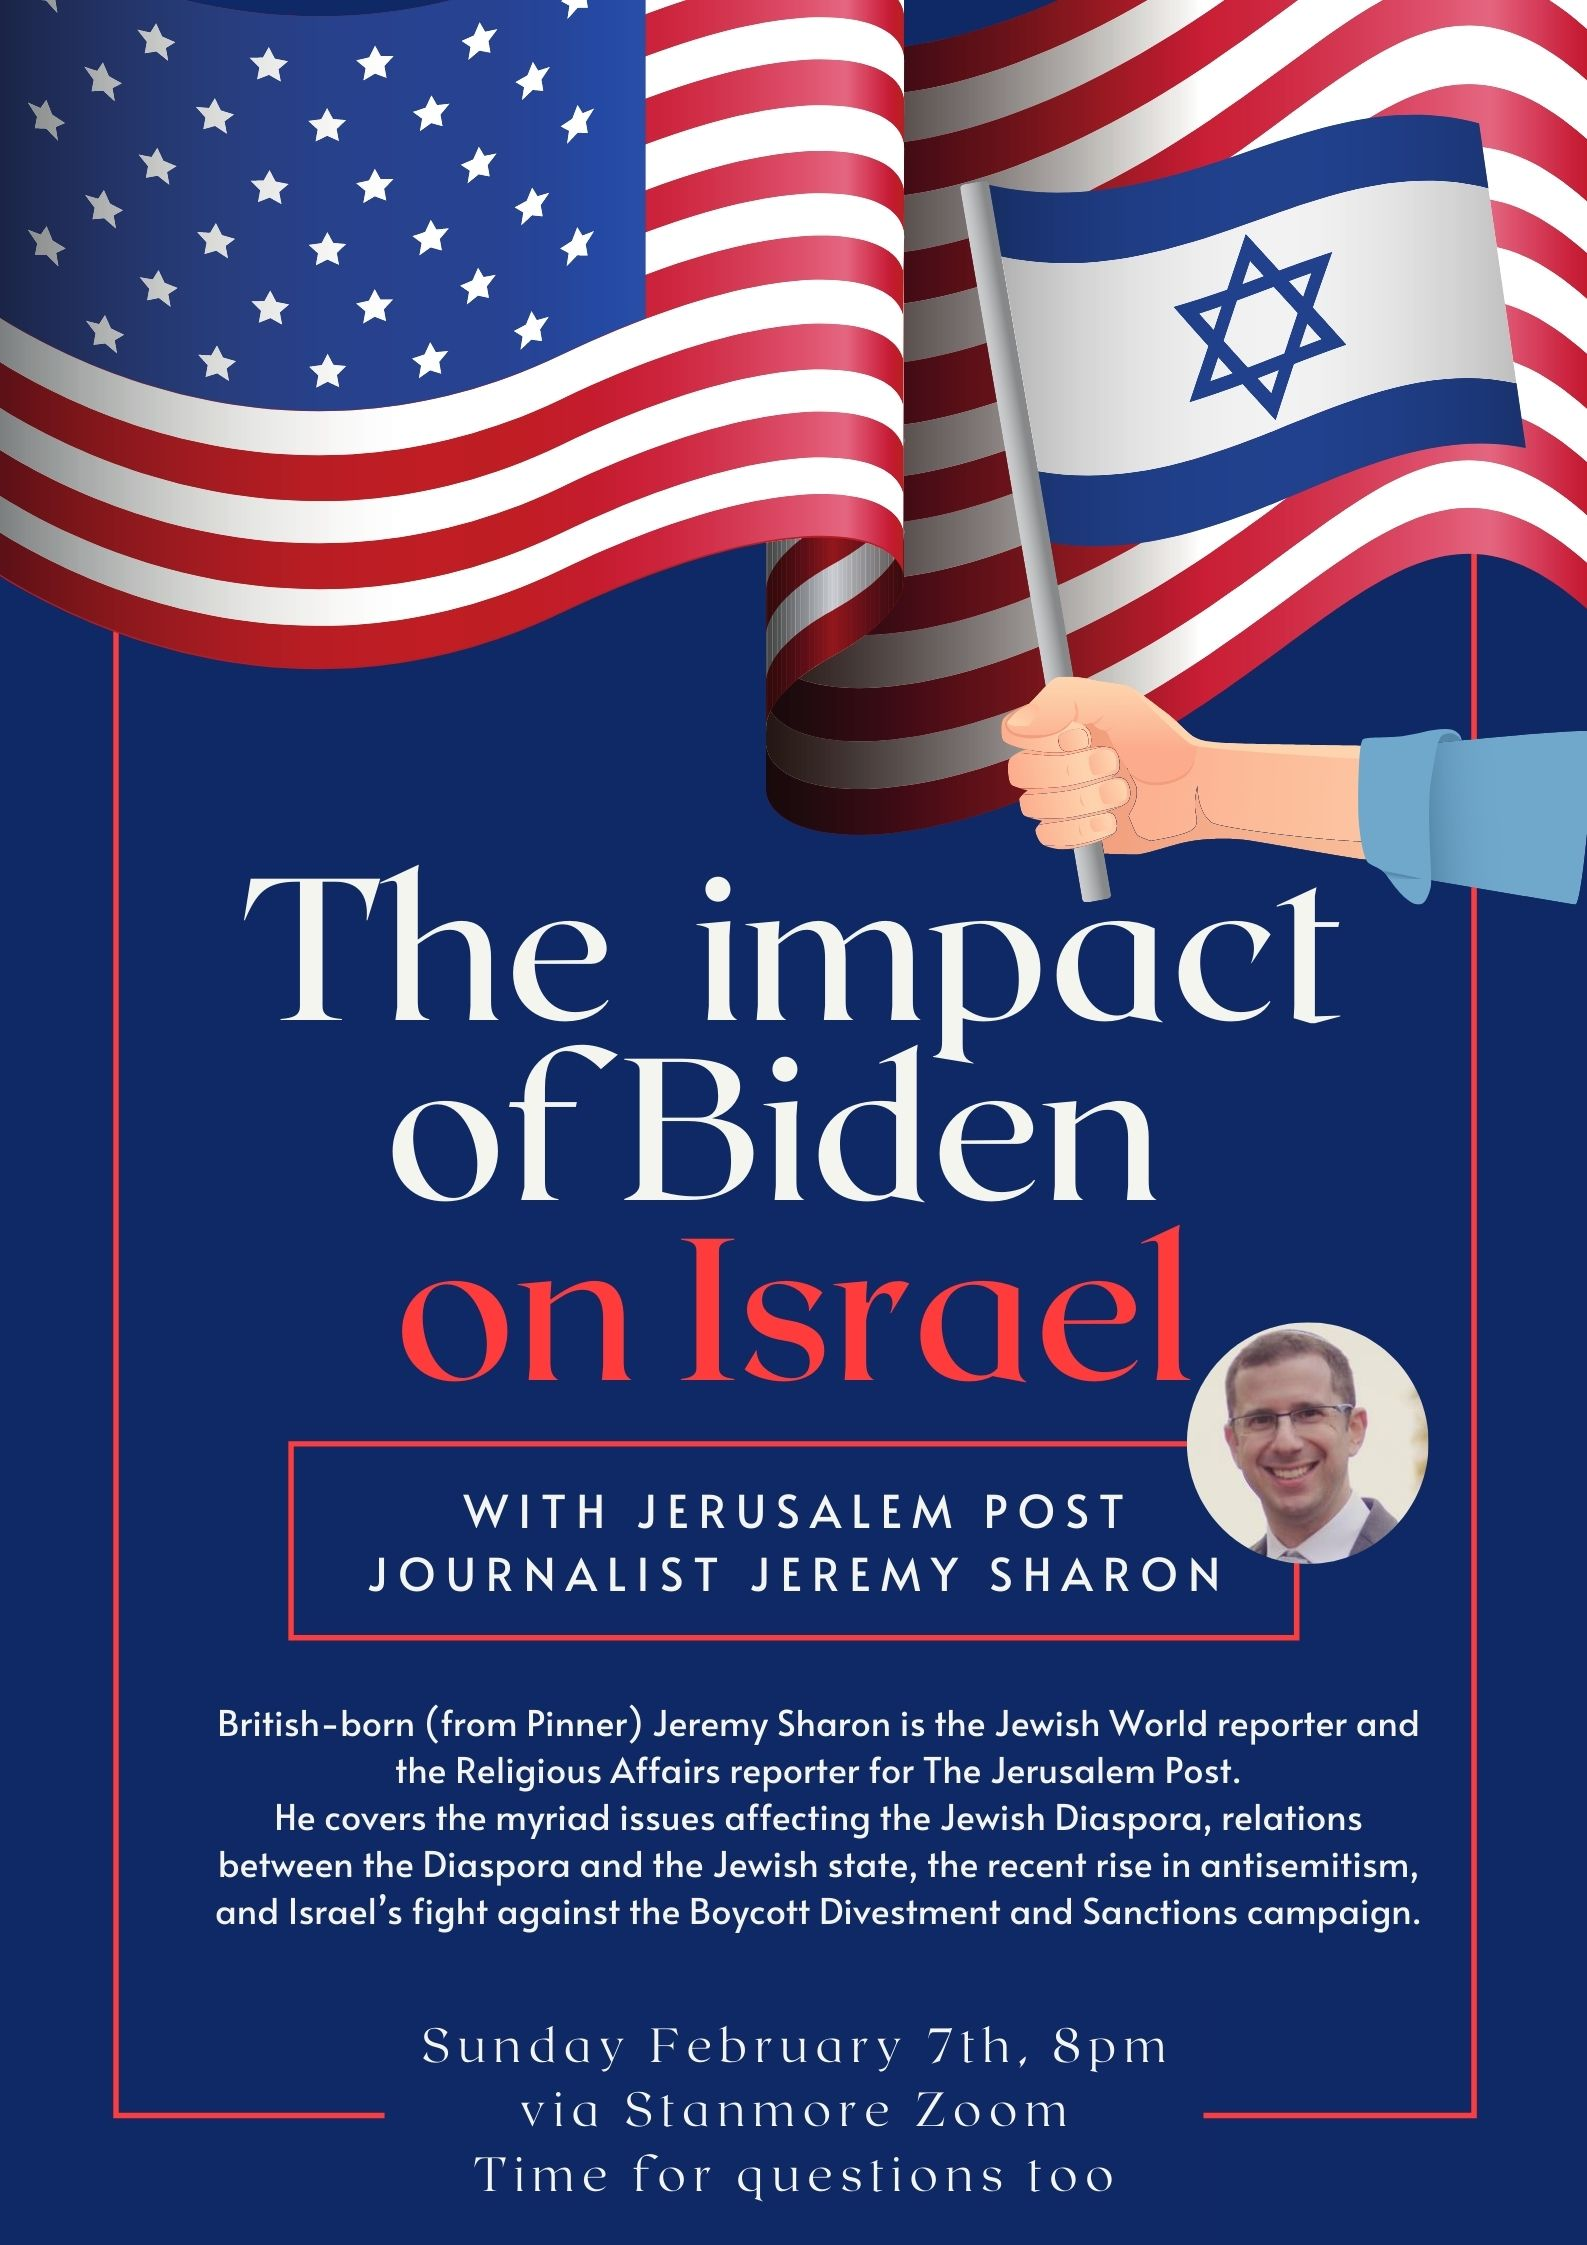 The impact of Biden on Israel